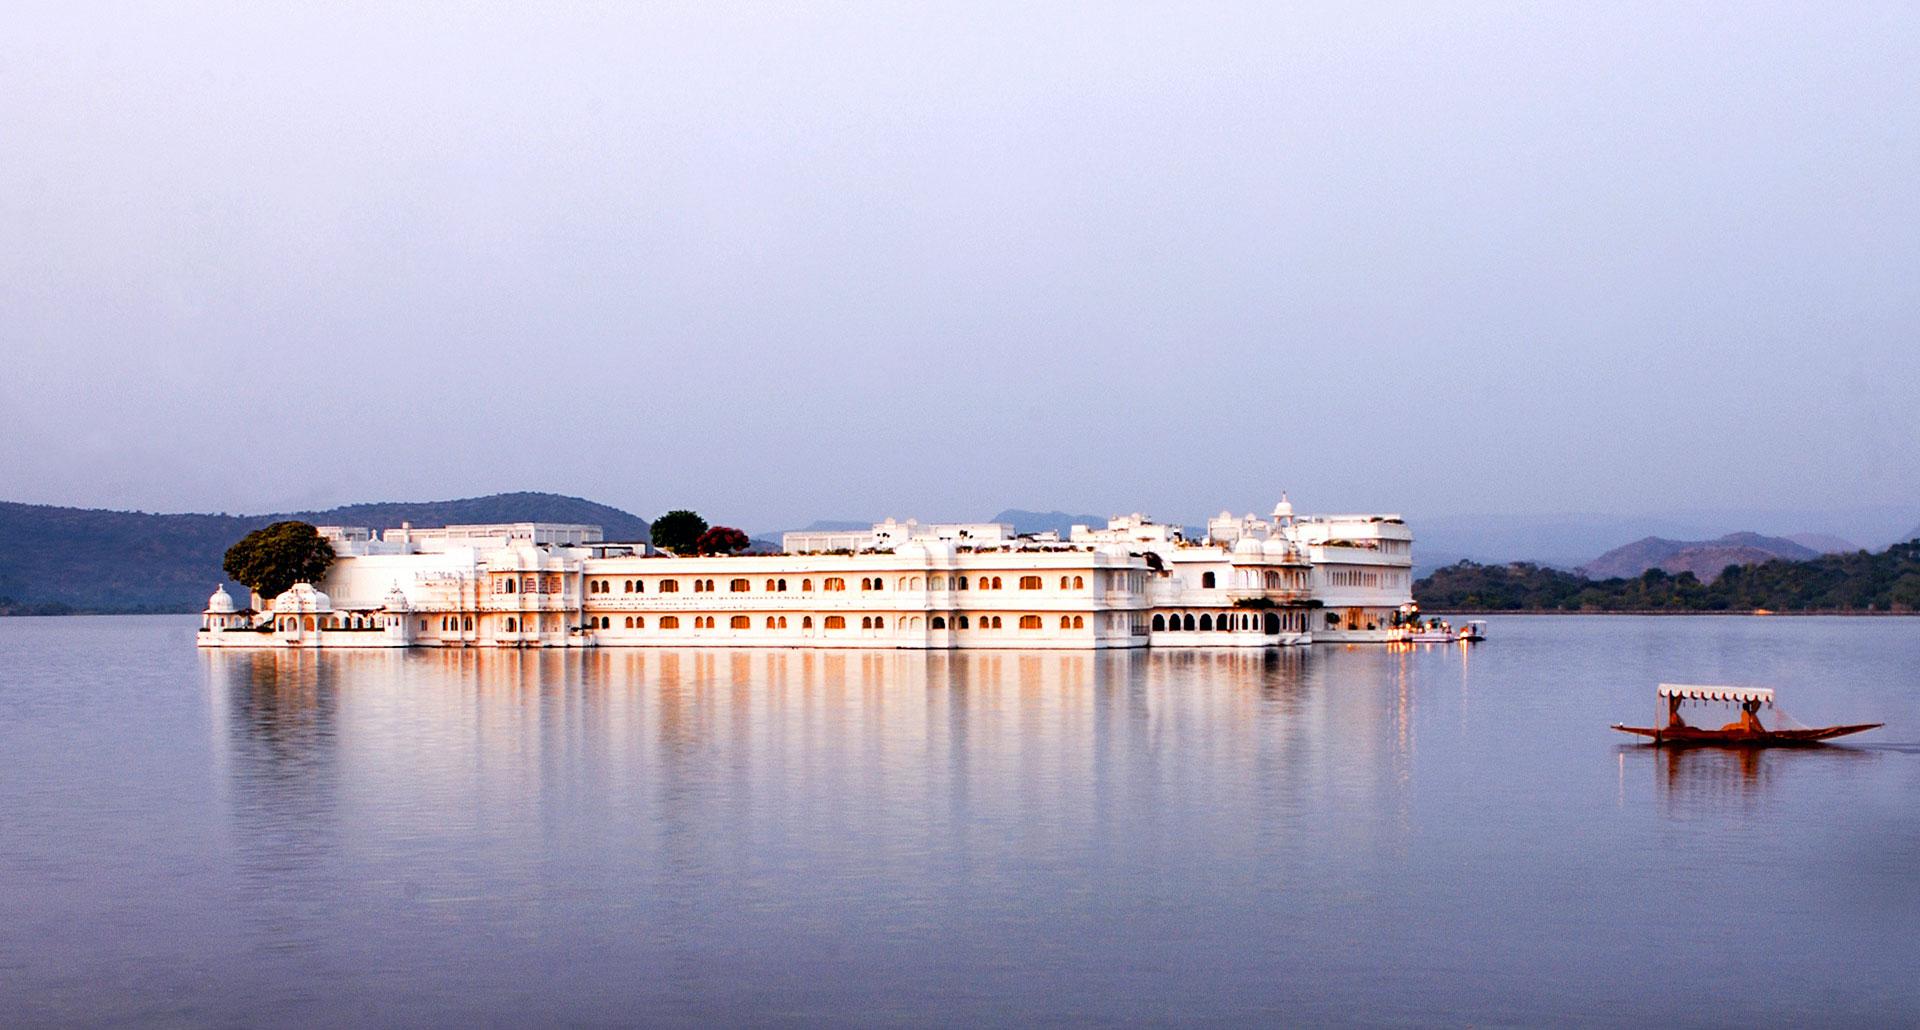 TAJ LAKE PALACE - boutique hotel in Lake Pichola